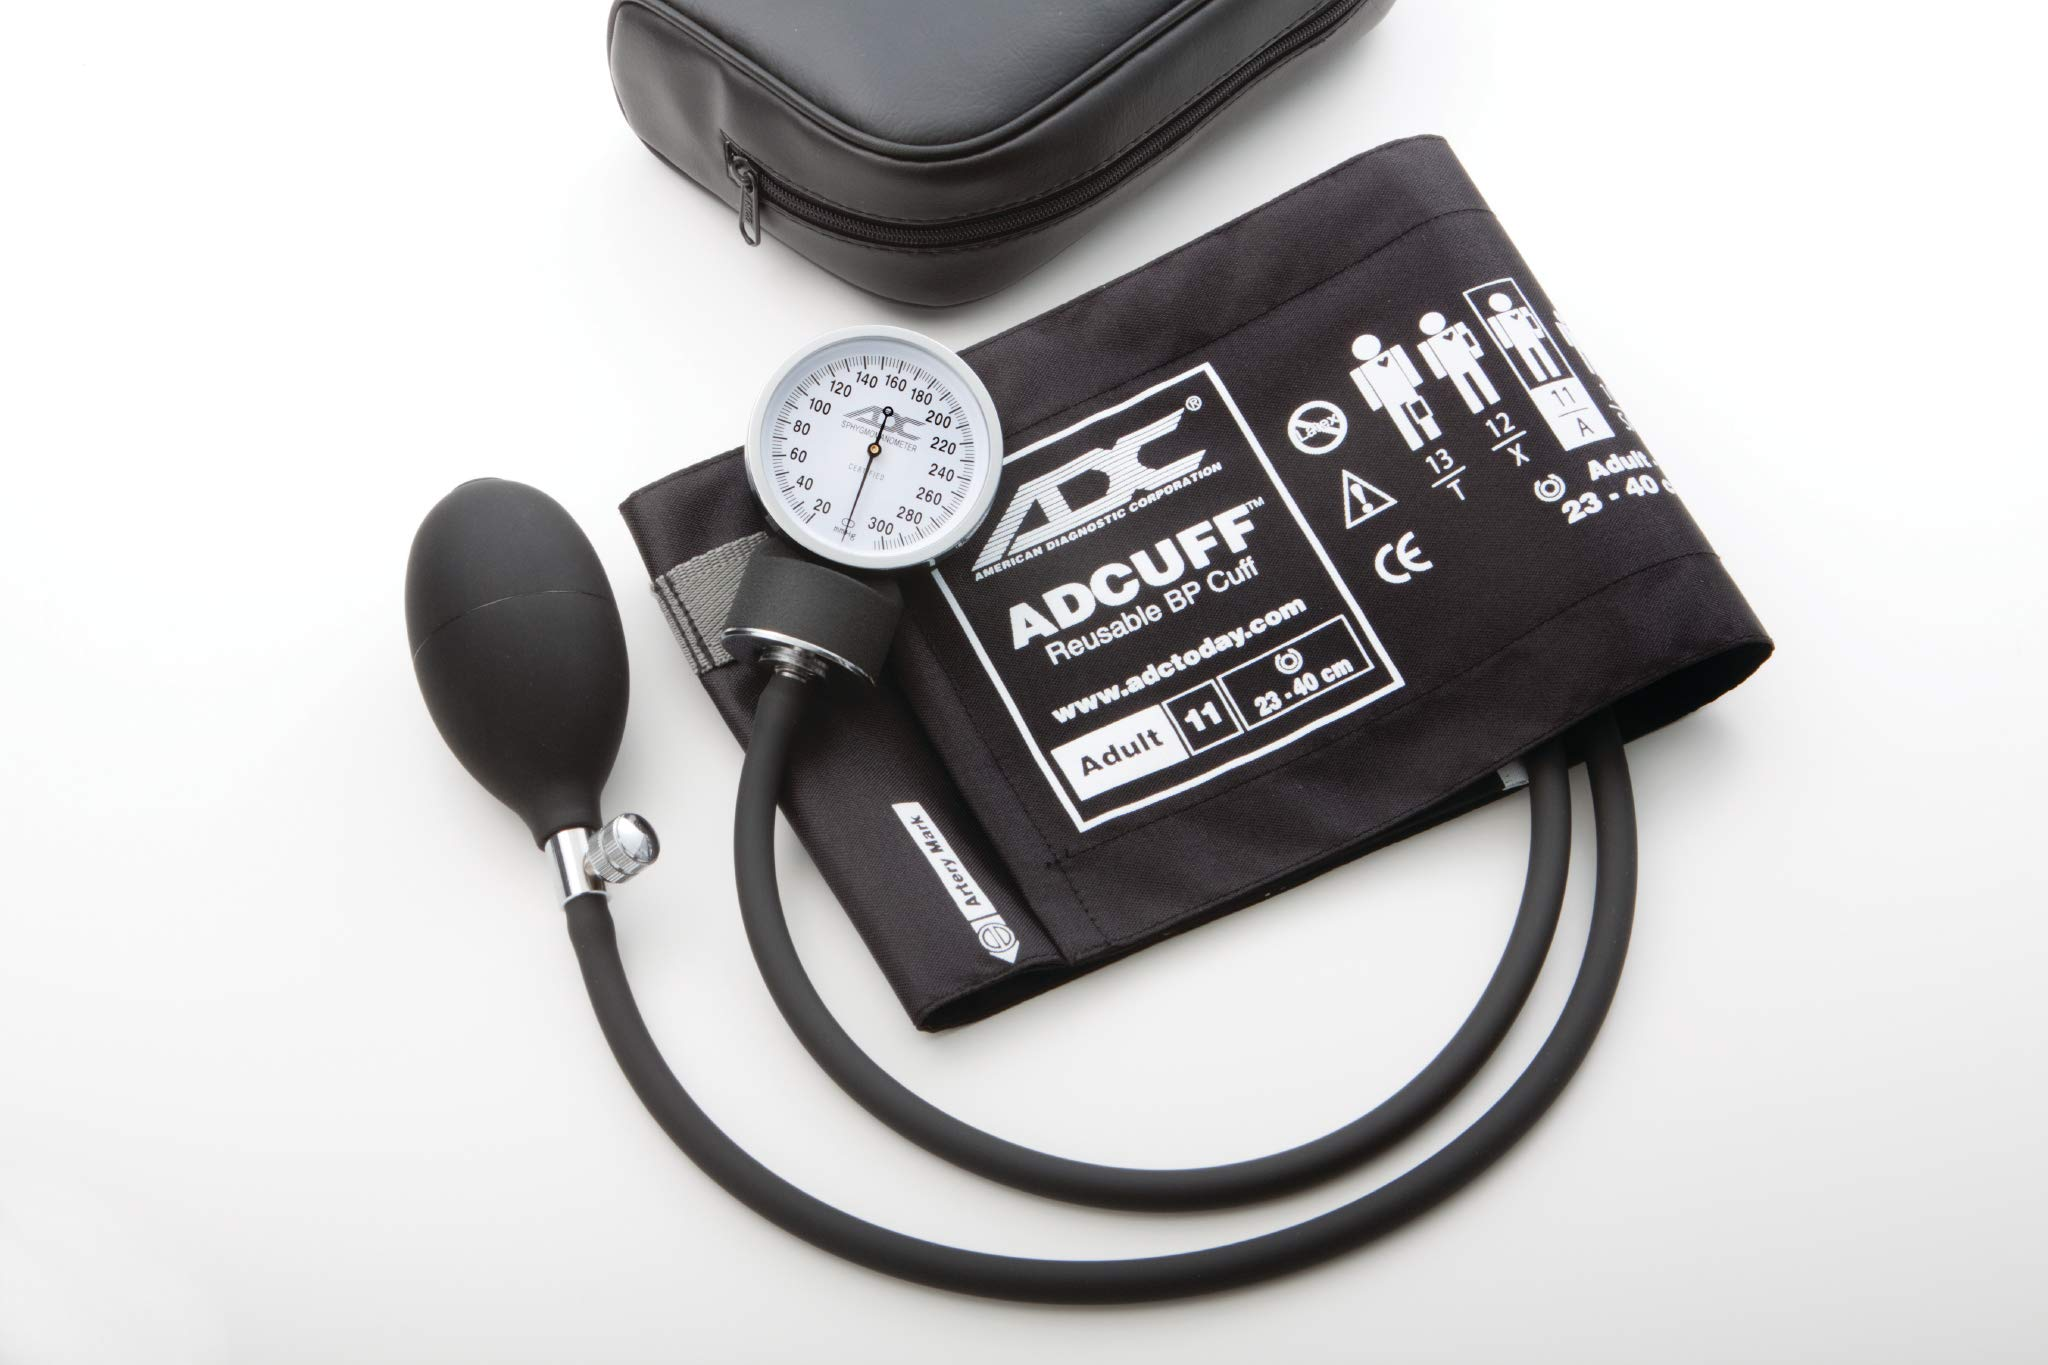 ADC 760-11ABK Prosphyg 760 Pocket Aneroid Sphygmomanometer with Adcuff Nylon Blood Pressure Cuff,